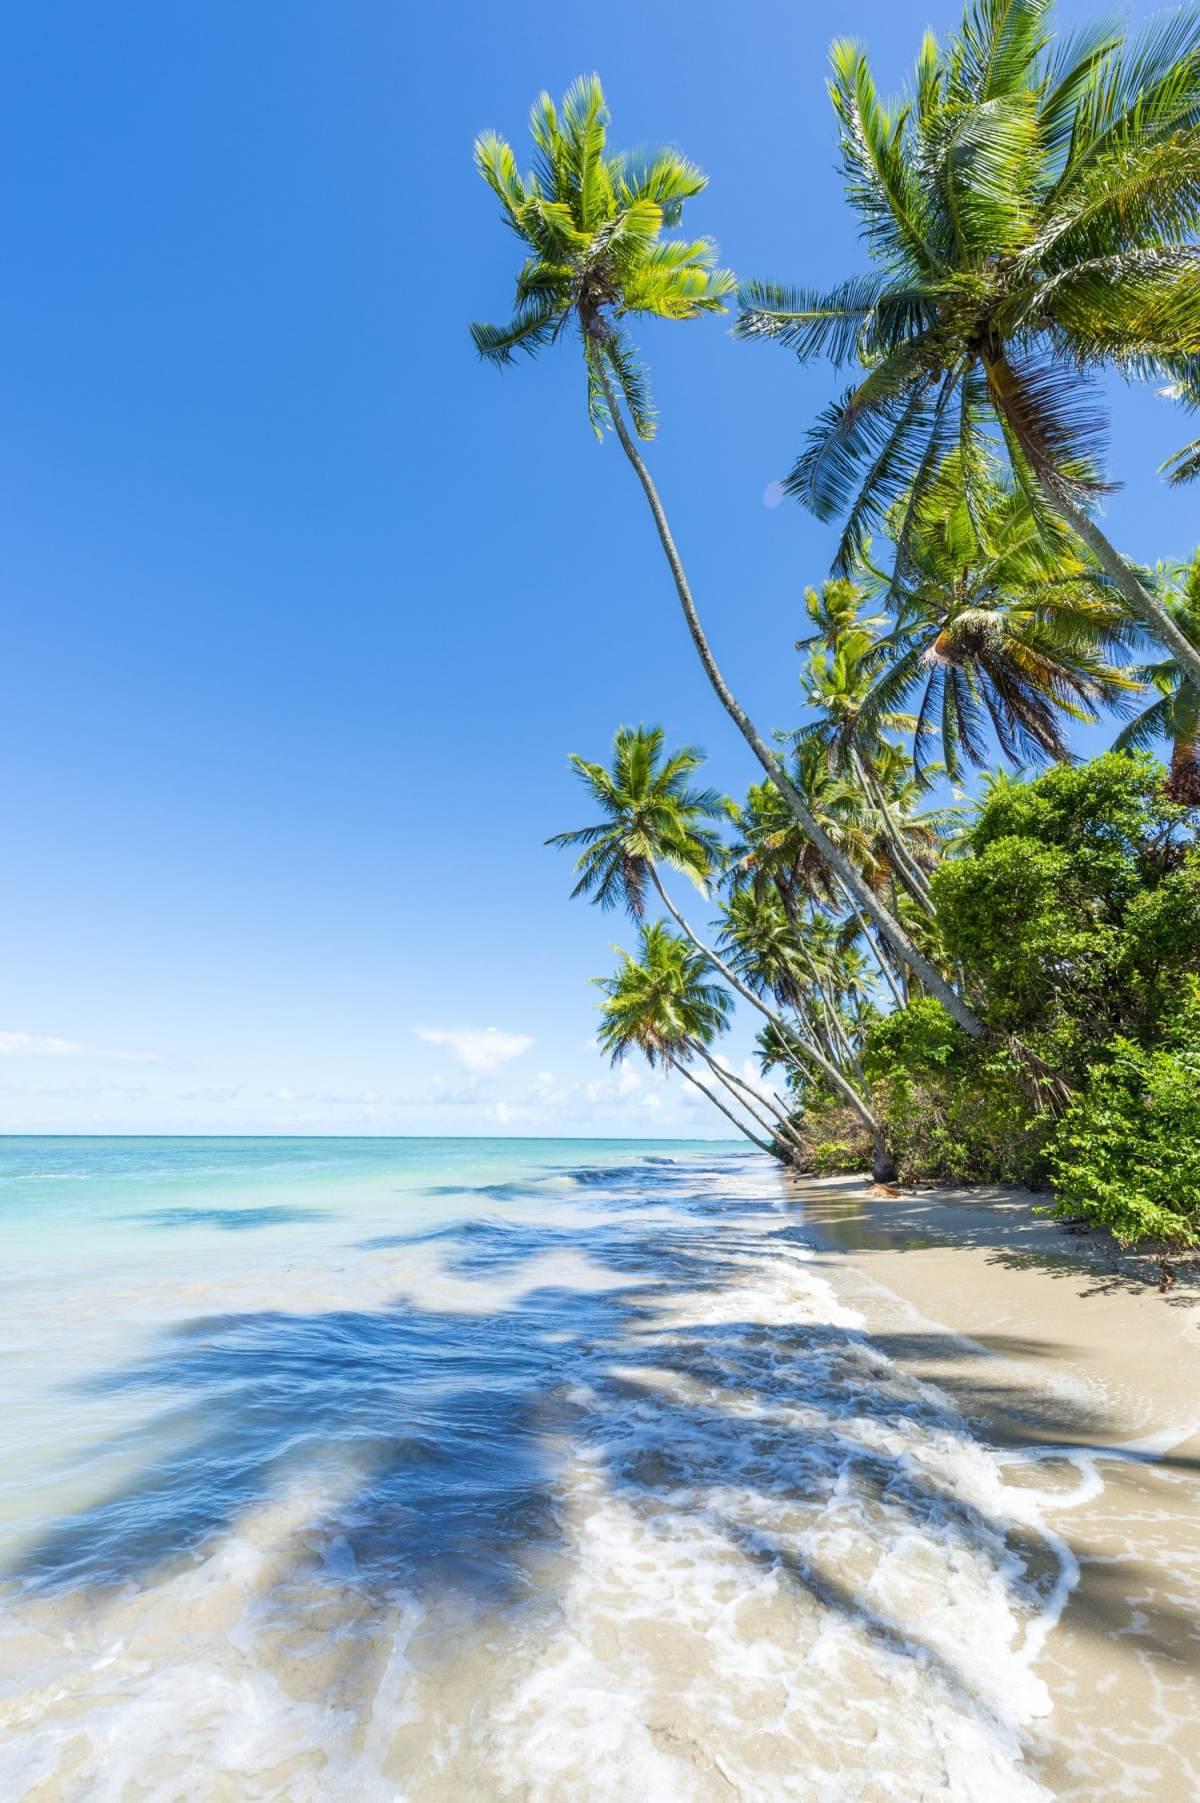 Brazil beach travel itinerary - South America